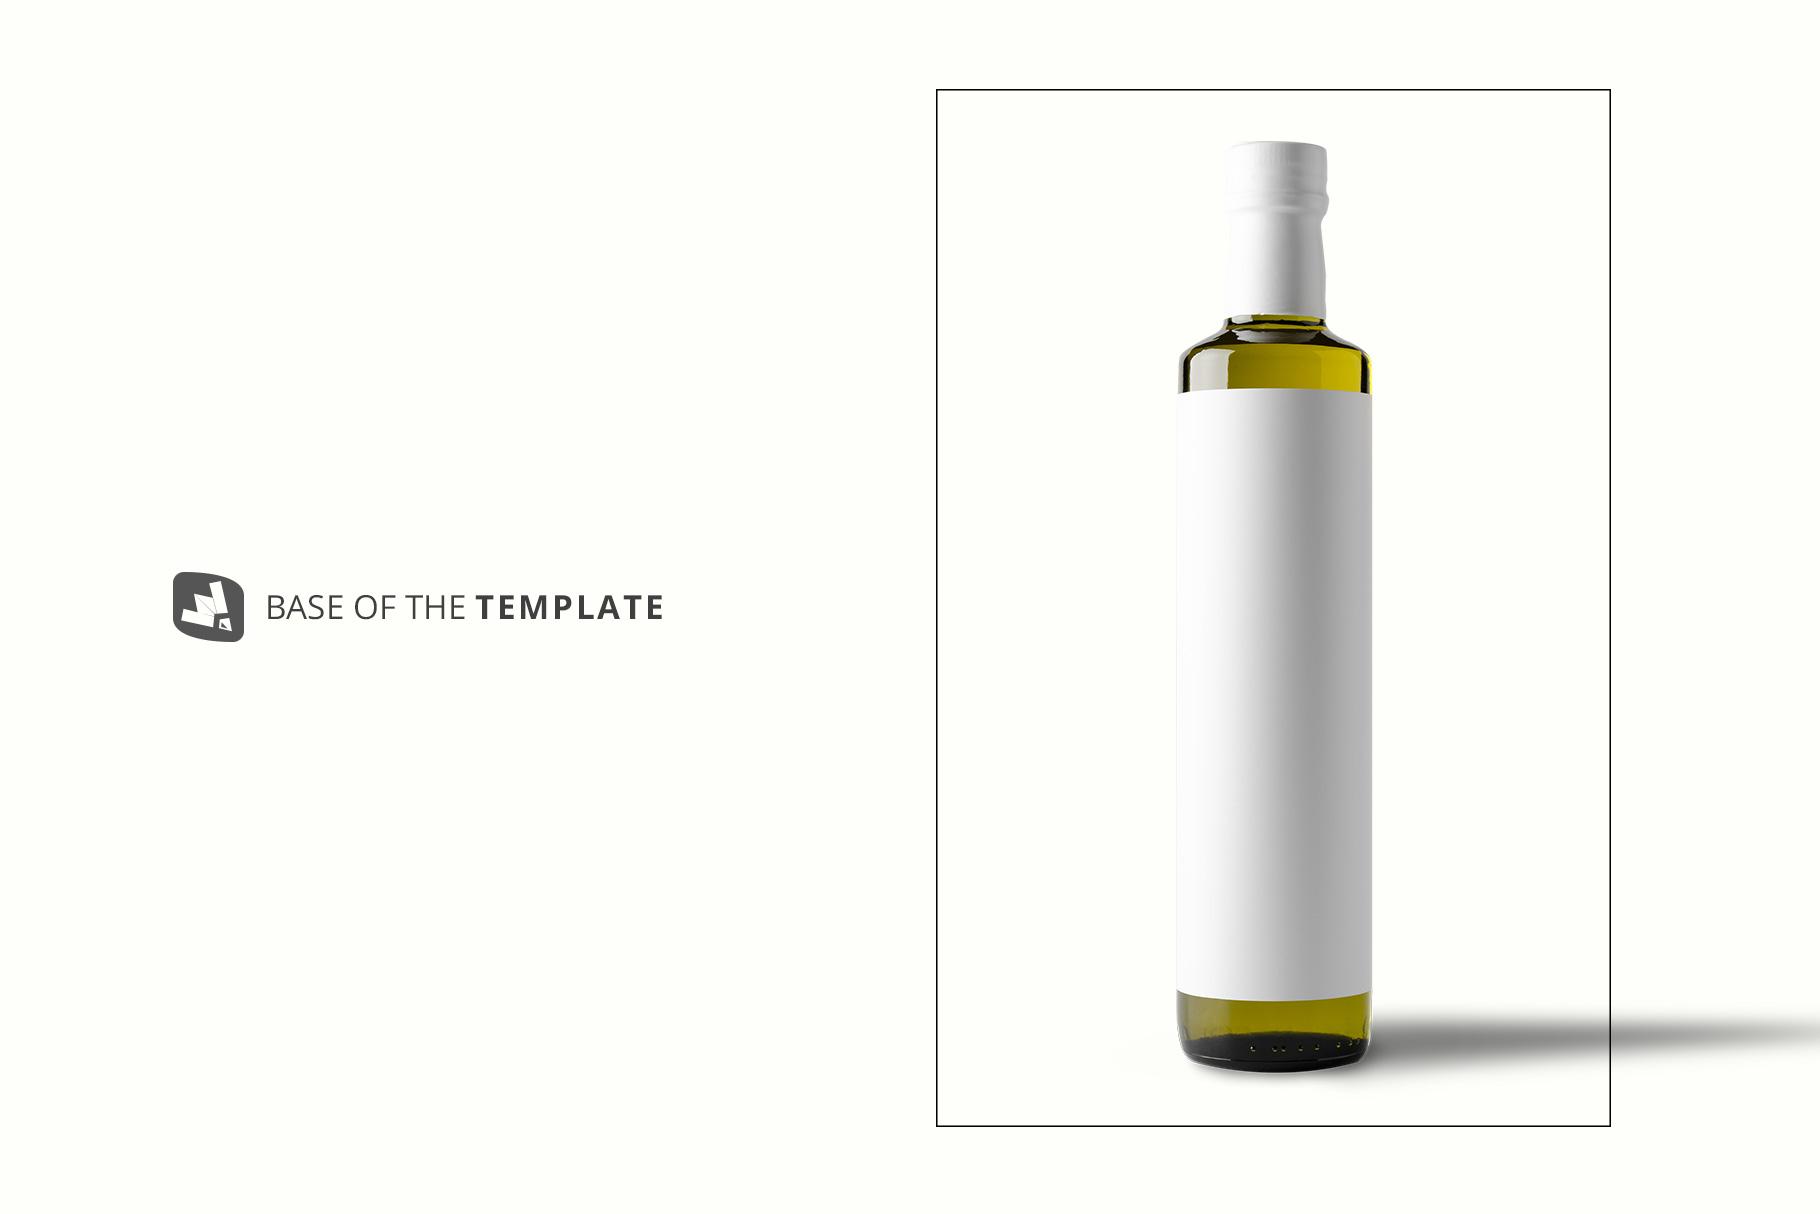 base image of the cooking oil bottle packaging mockup